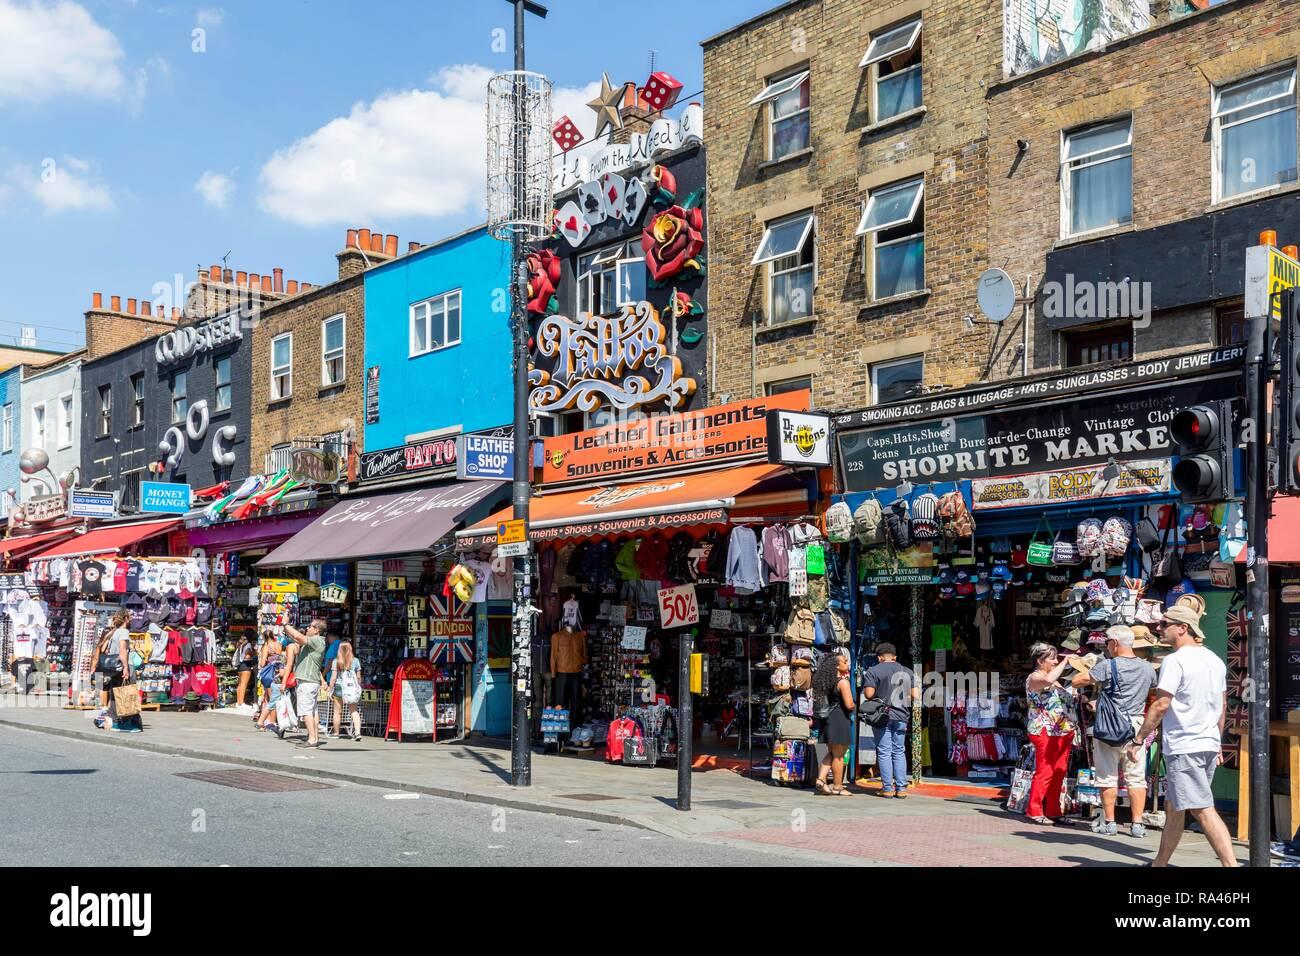 Shops on Camden High Street, Camden Market, Camden, London, United Kingdom - Stock Image